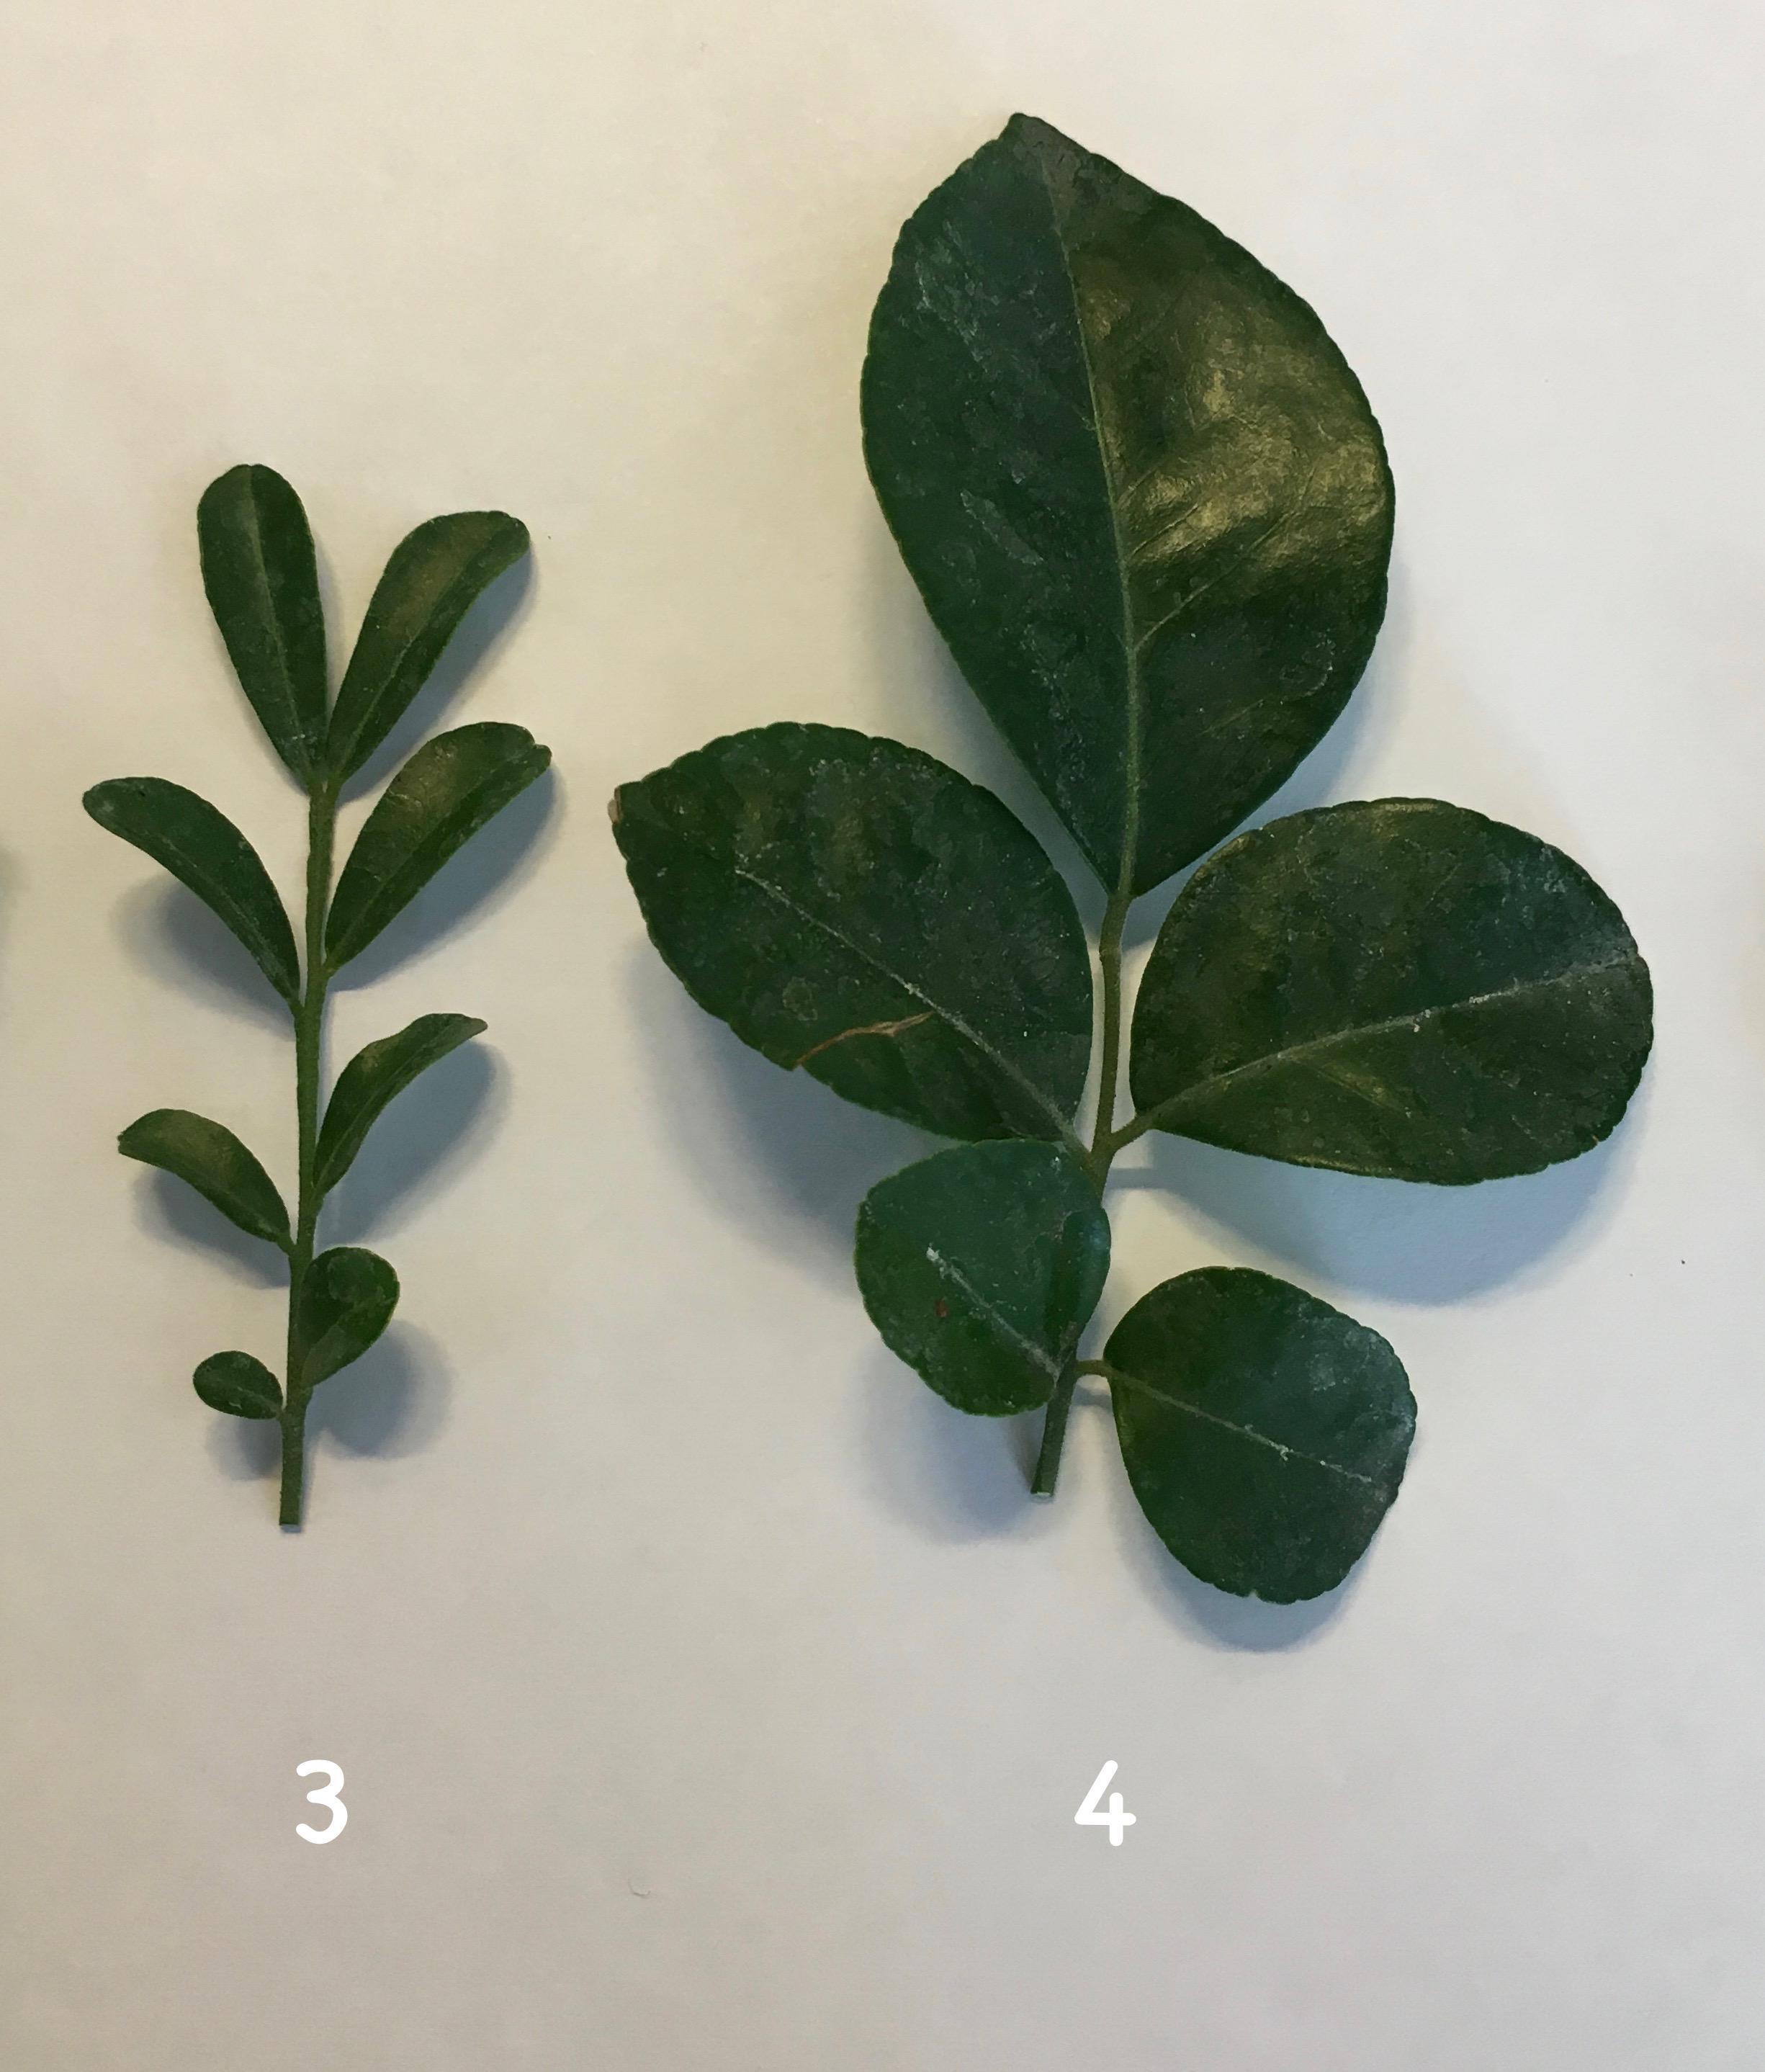 Murraya paniculata «Min-a-min» dwarf 23 (слева) Murraya paniculata 'Min-a-min' (big leaf) 25 (справа)